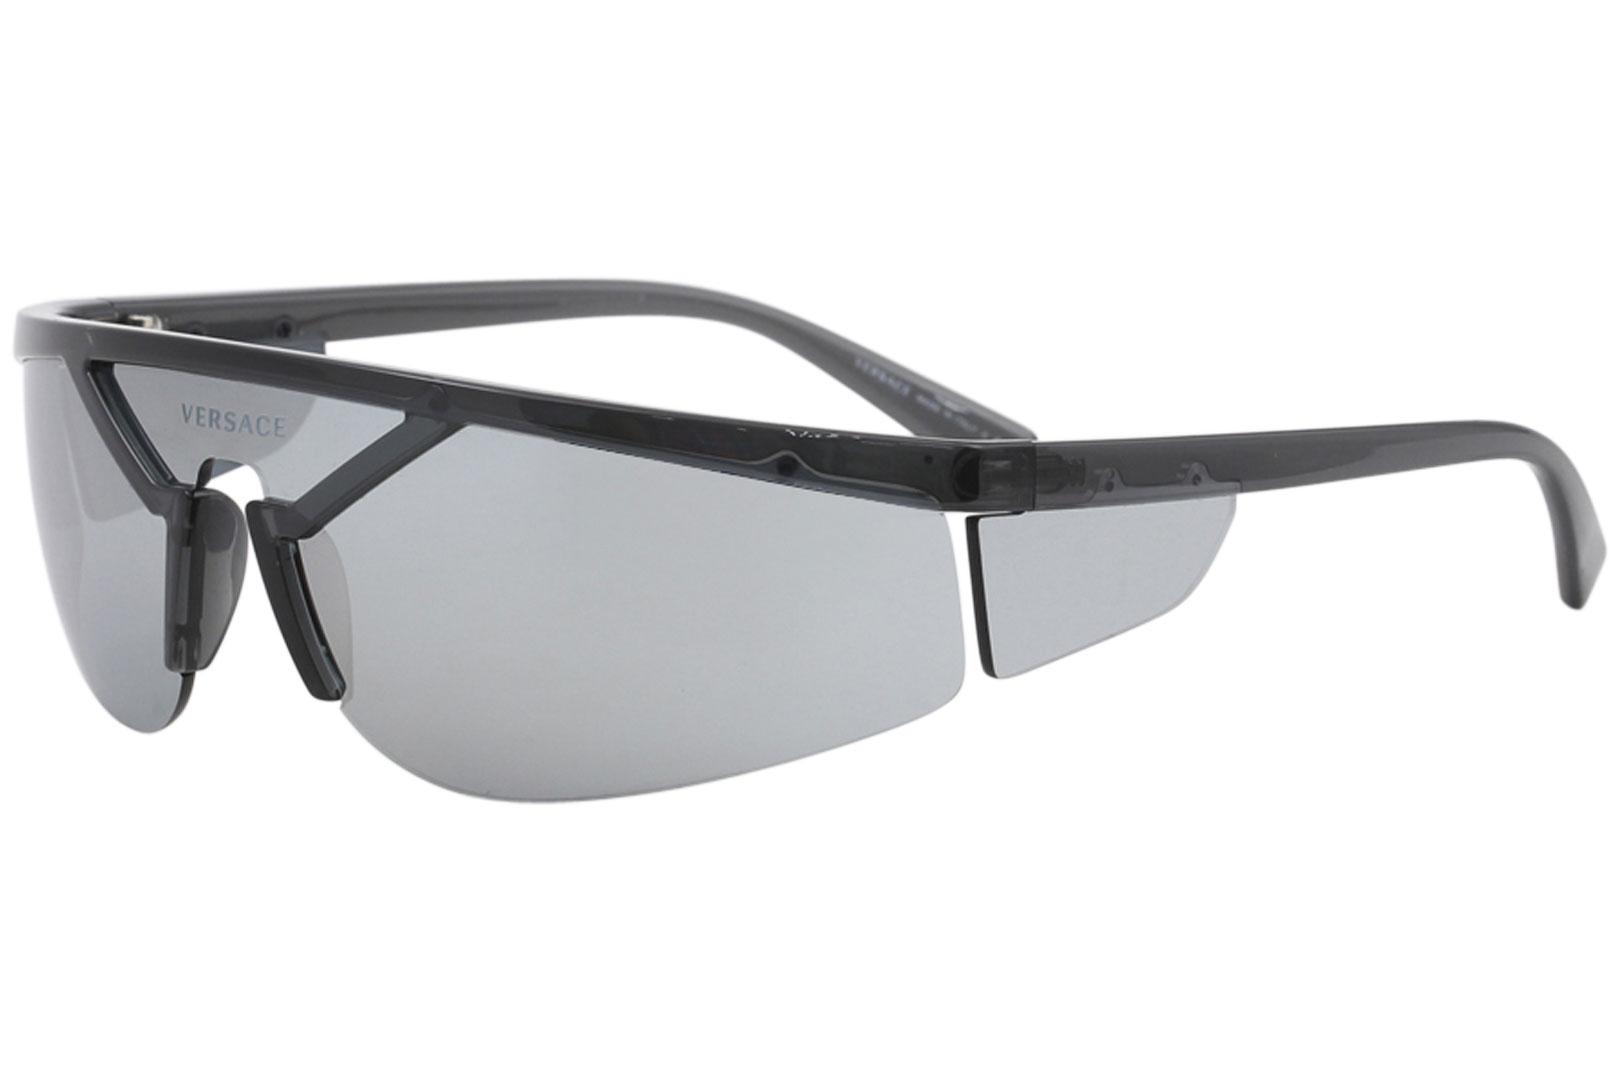 f9e9e7a64a Details about Versace Men s VE4349 VE 4349 52811U Transparent Dark Grey  Sunglasses 80mm